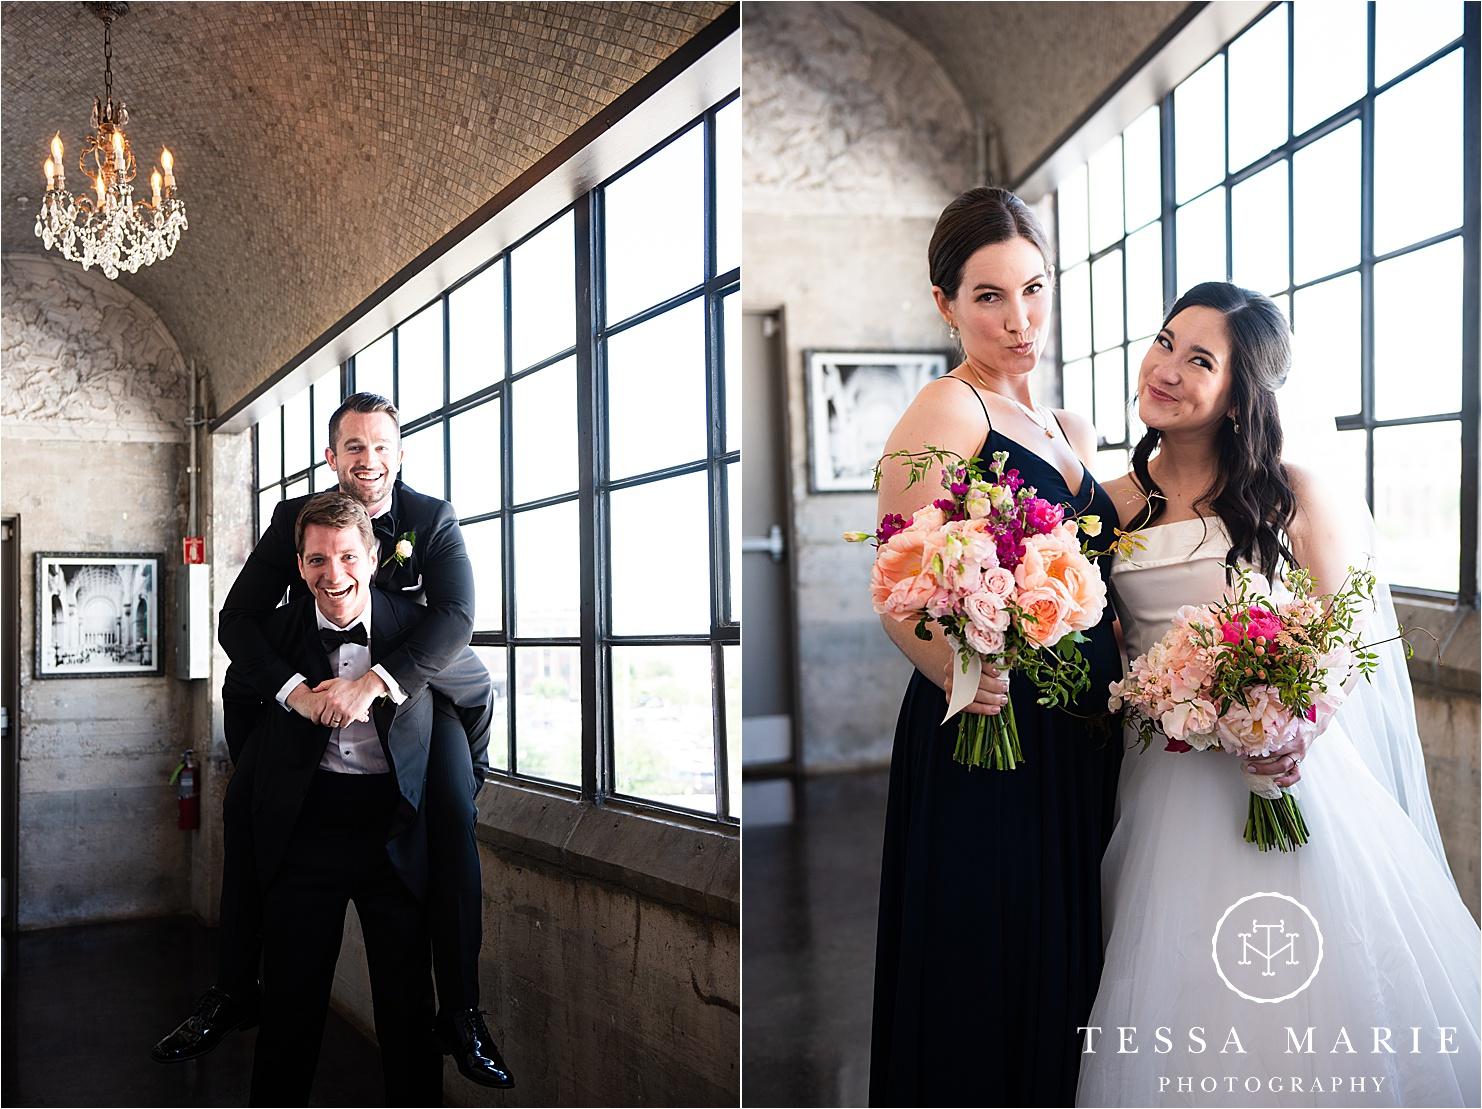 Tessa_marie_weddings_houston_wedding_photographer_The_astorian_0079.jpg